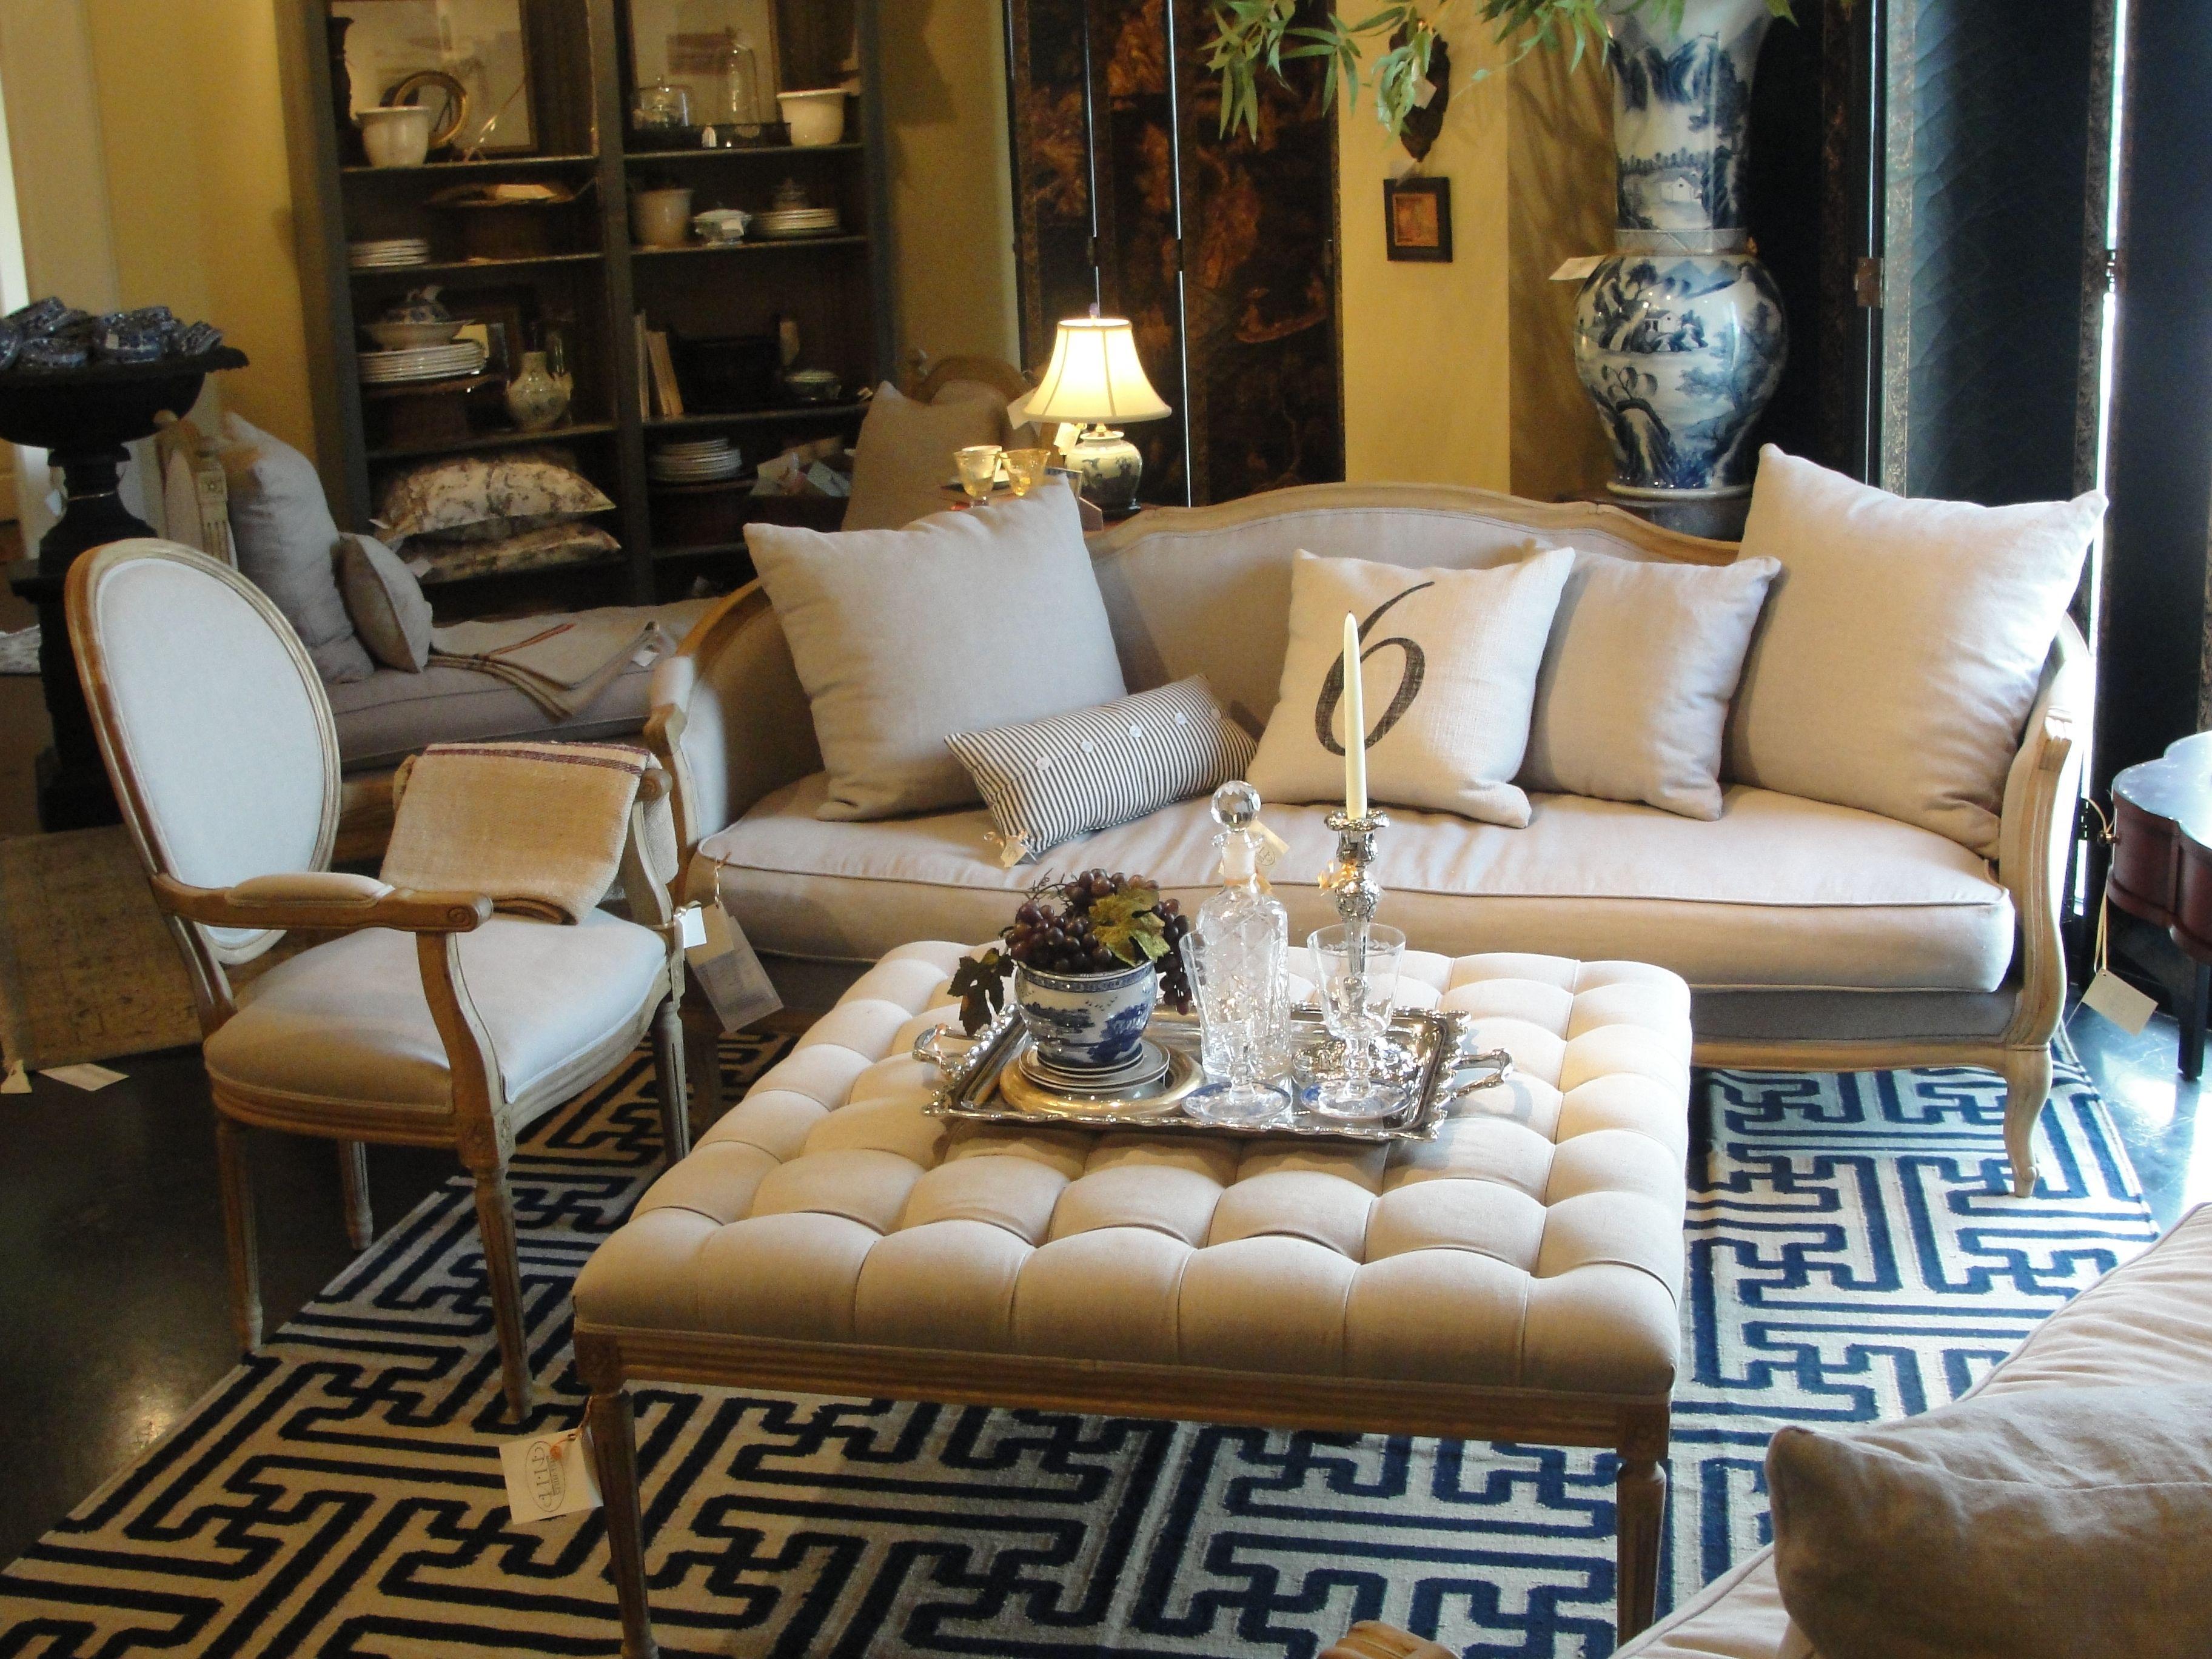 Ottoman Coffee Table Ideas.Ottoman Coffee Table Luxurious Living Room Furniture Cream Velvet